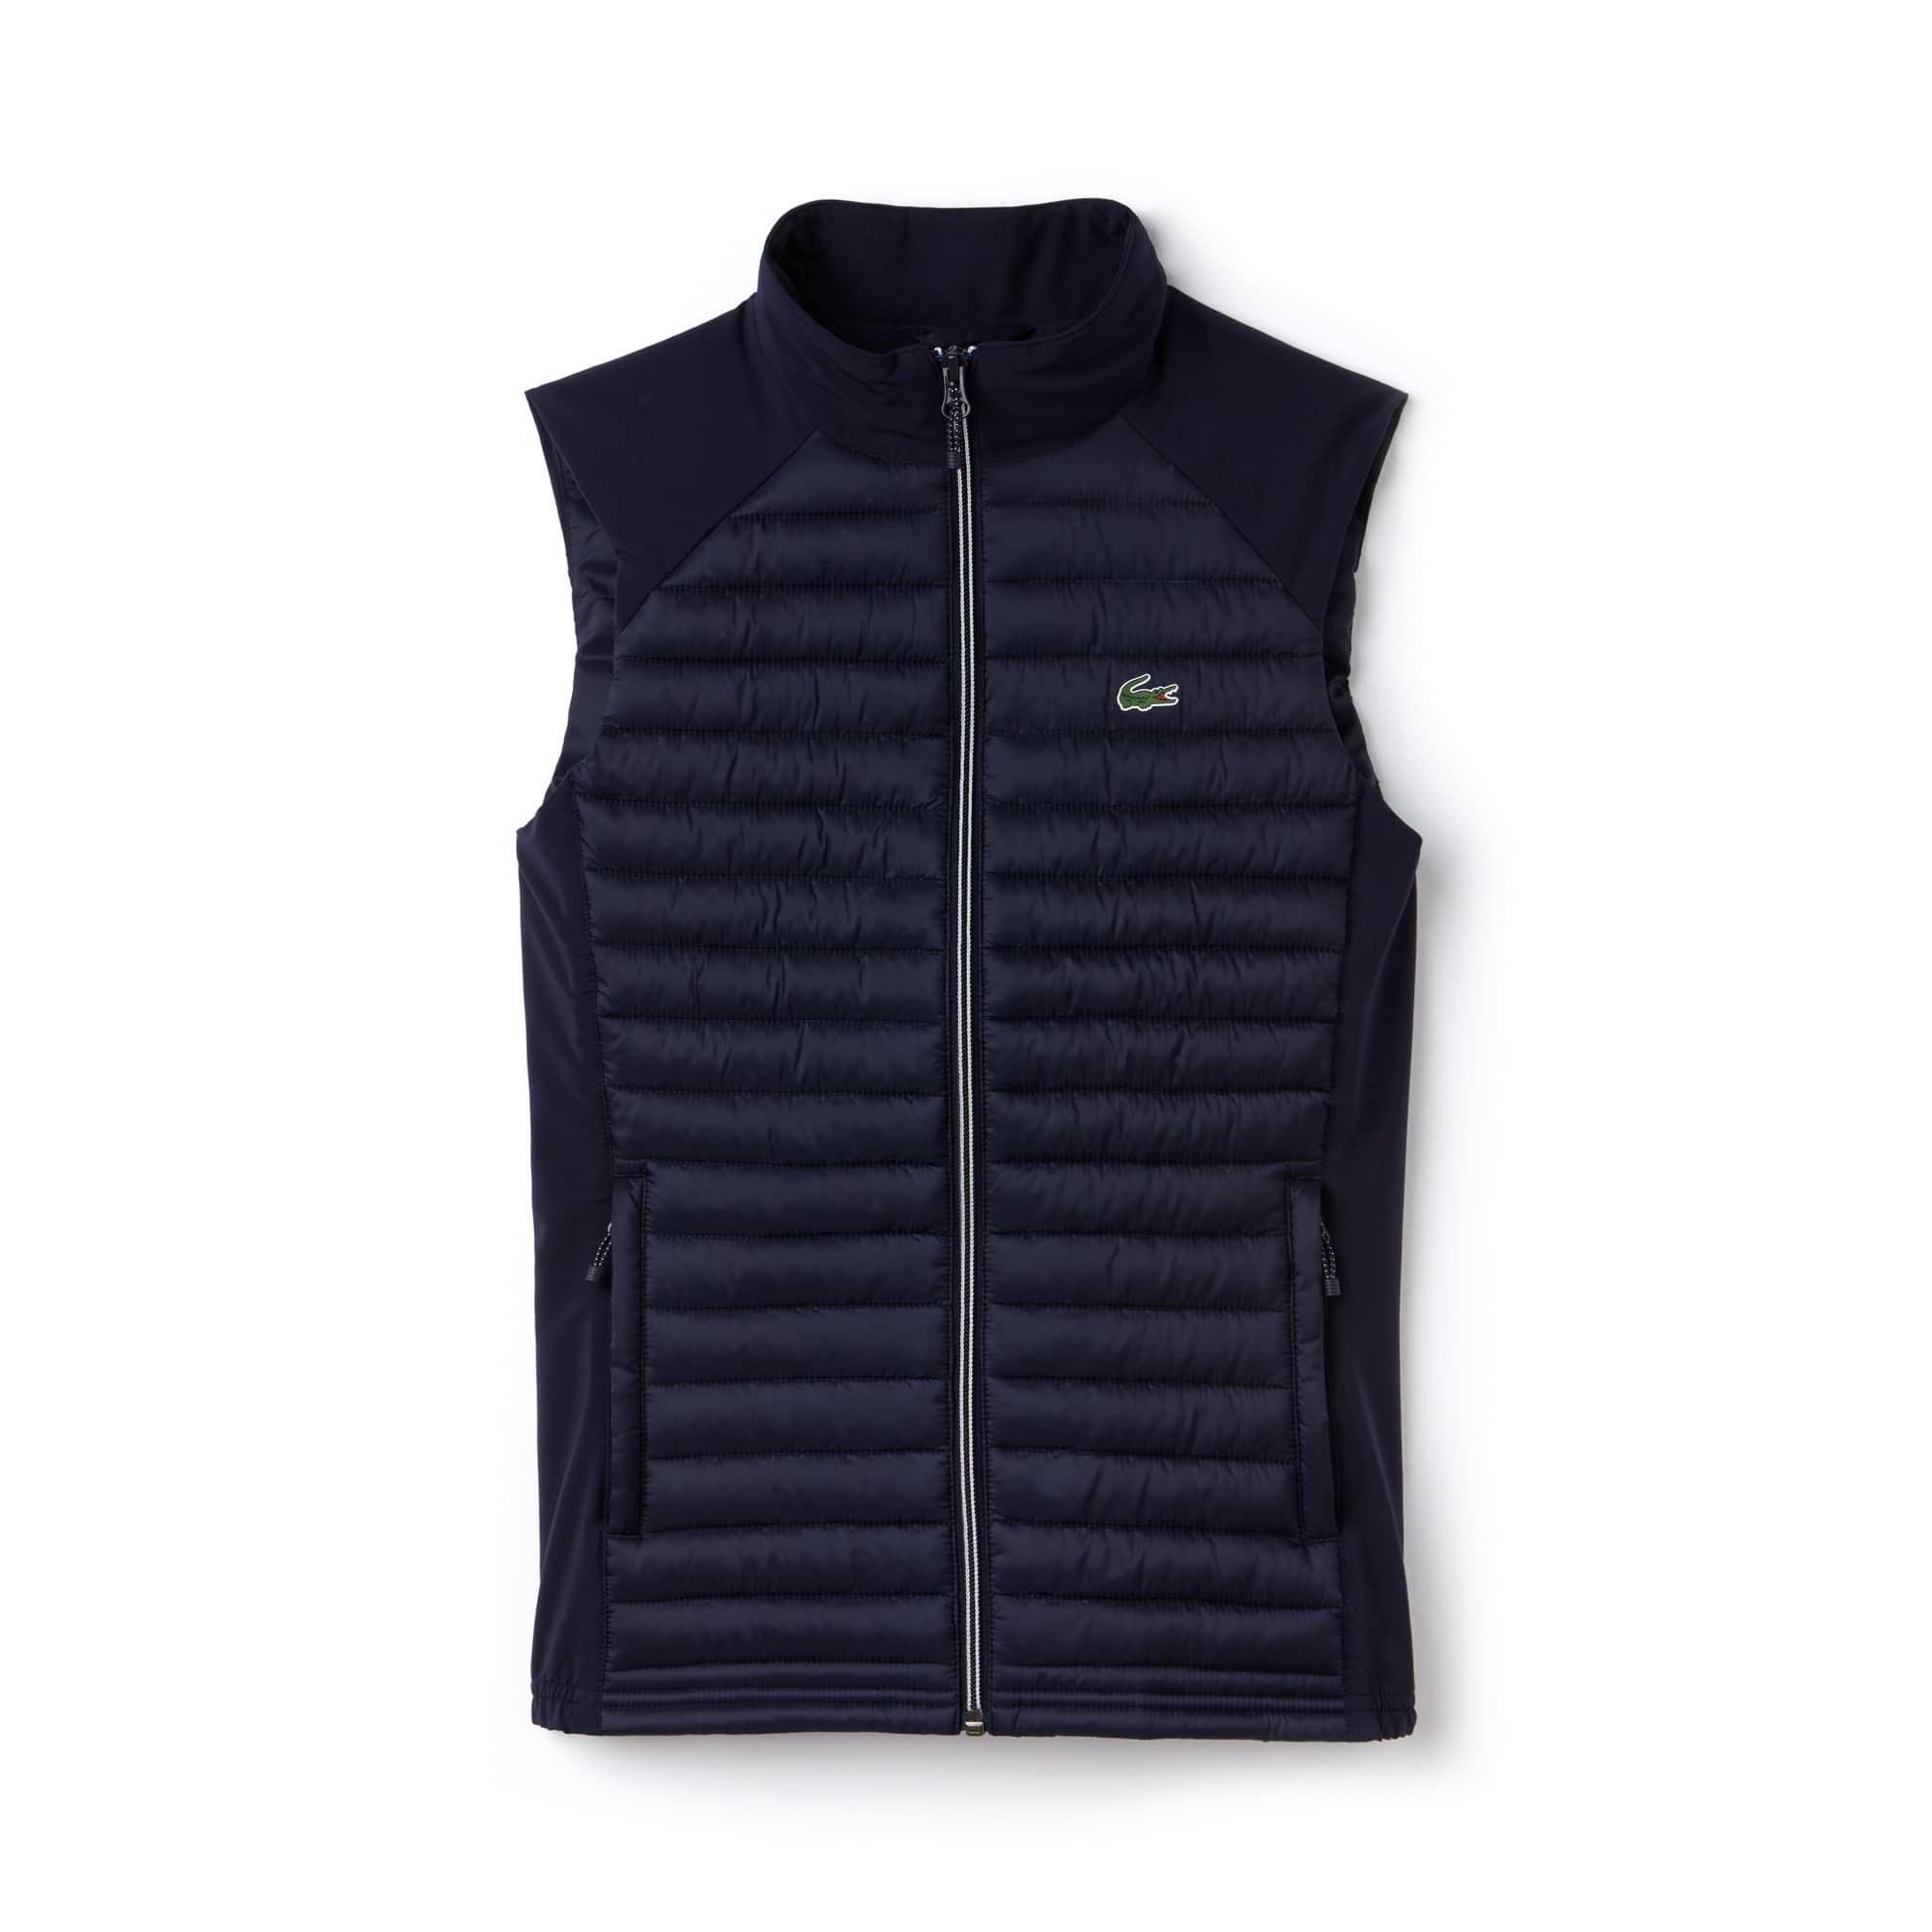 Damen LACOSTE SPORT Ryder Cup Edition funktionelle Golf Jacke